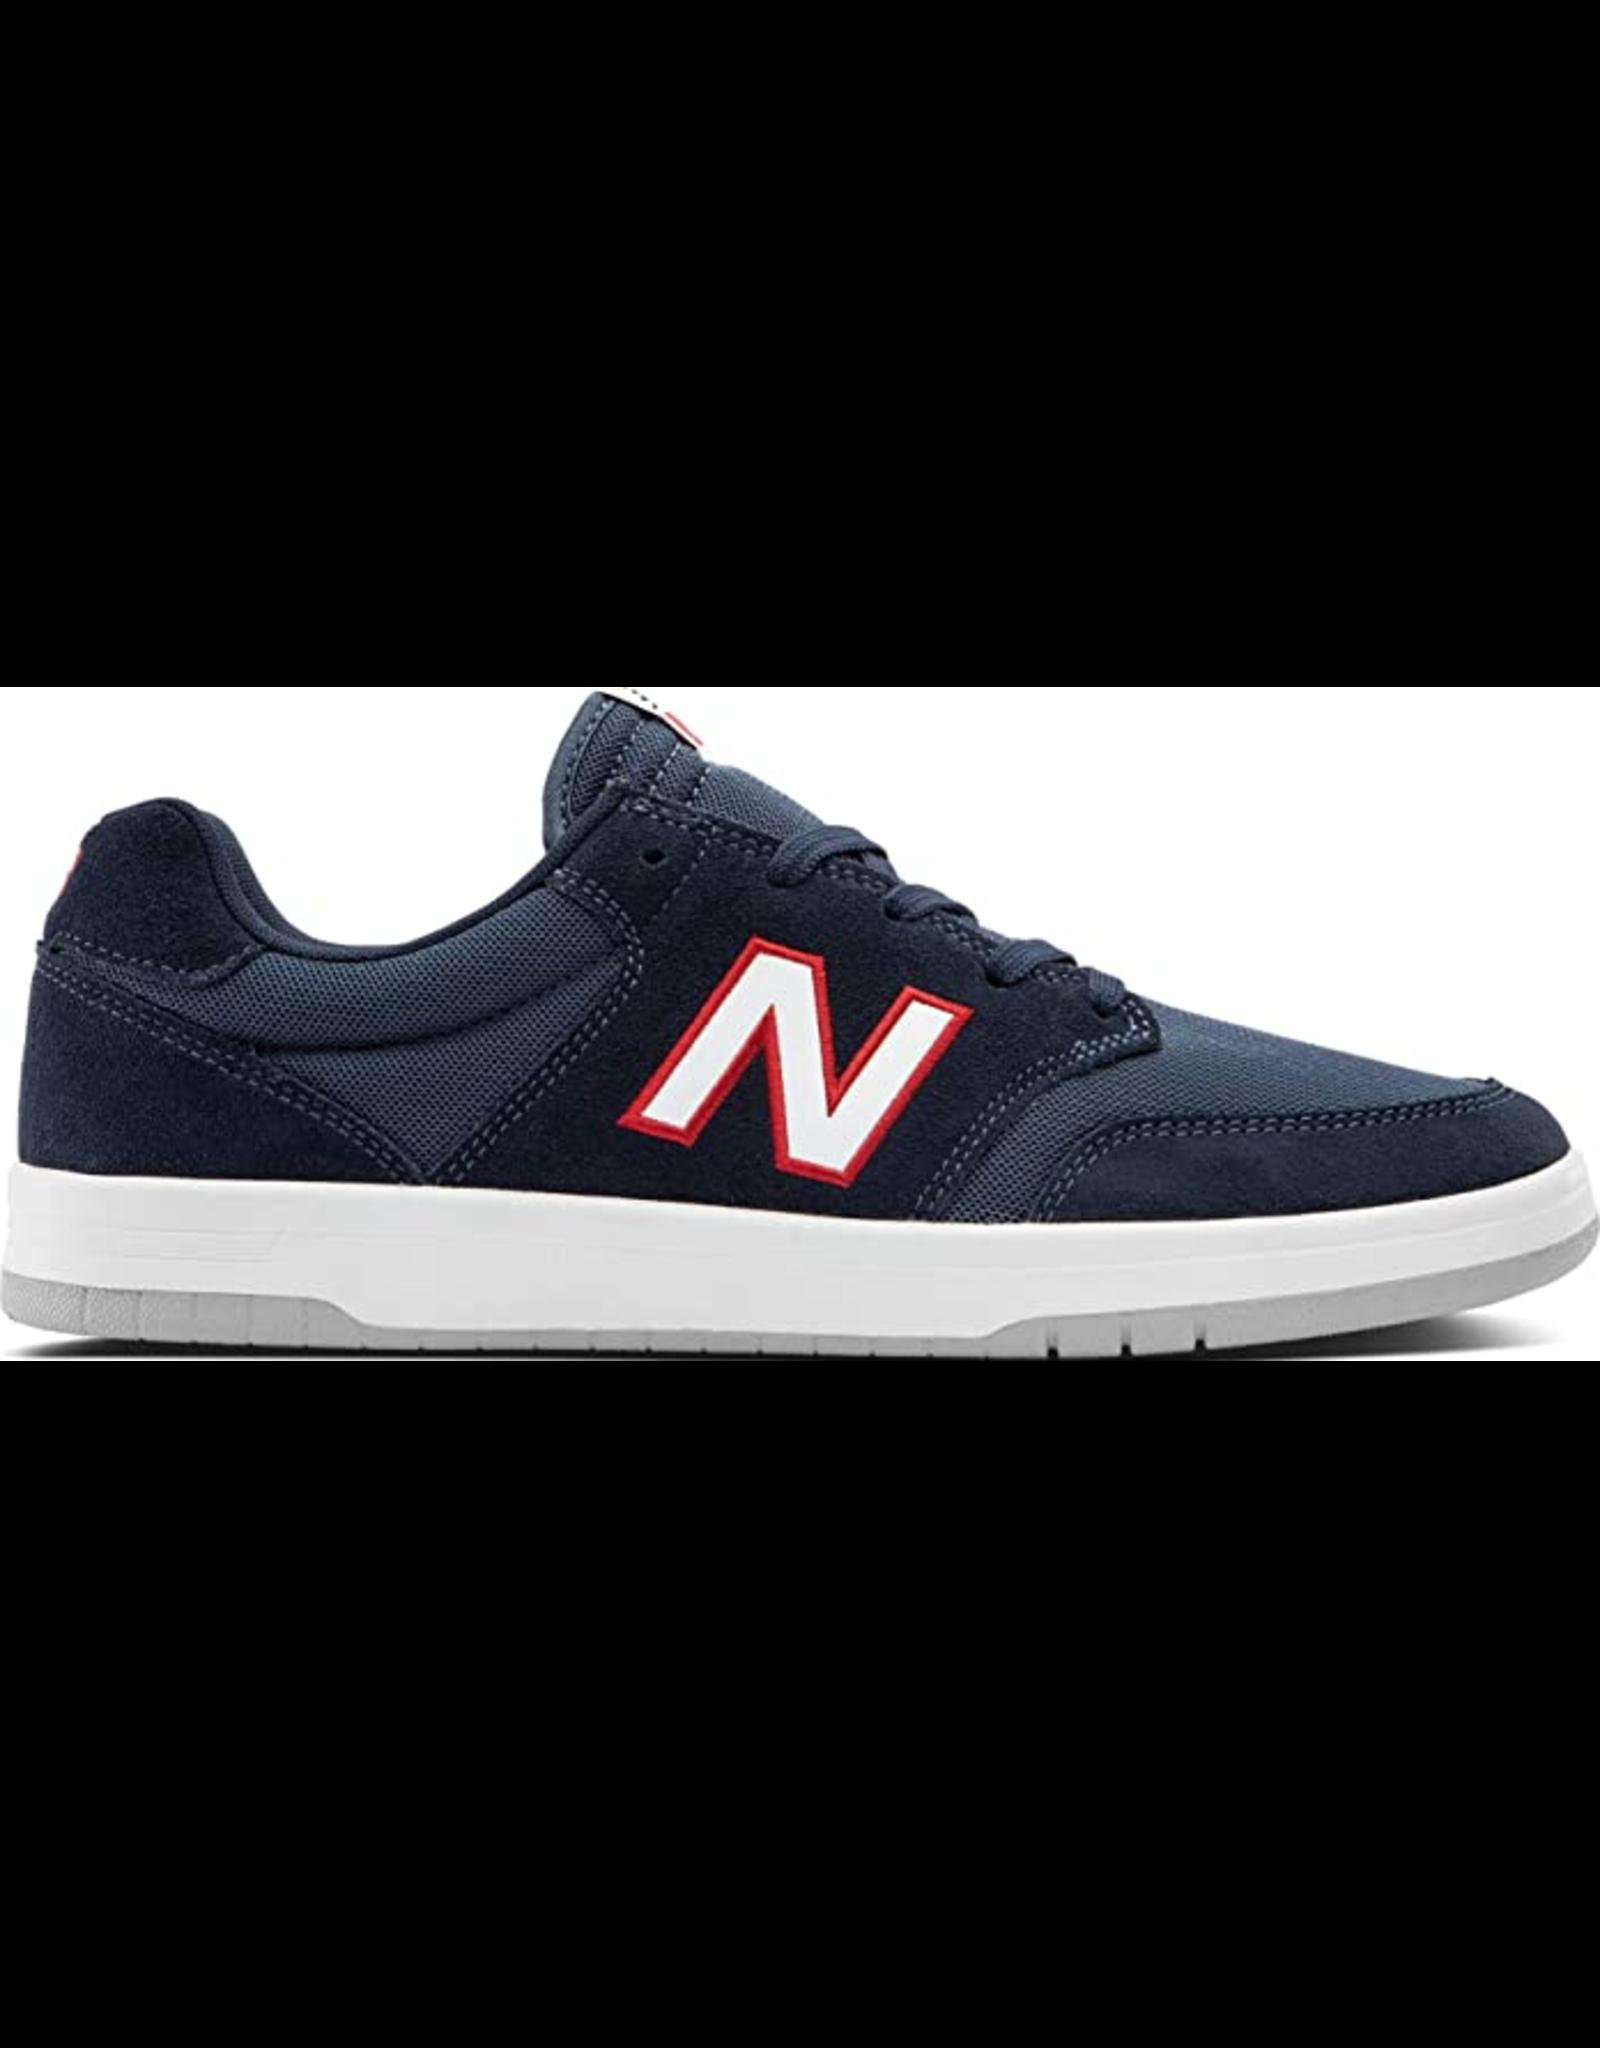 New Balance Numeric 425 - Navy Blue